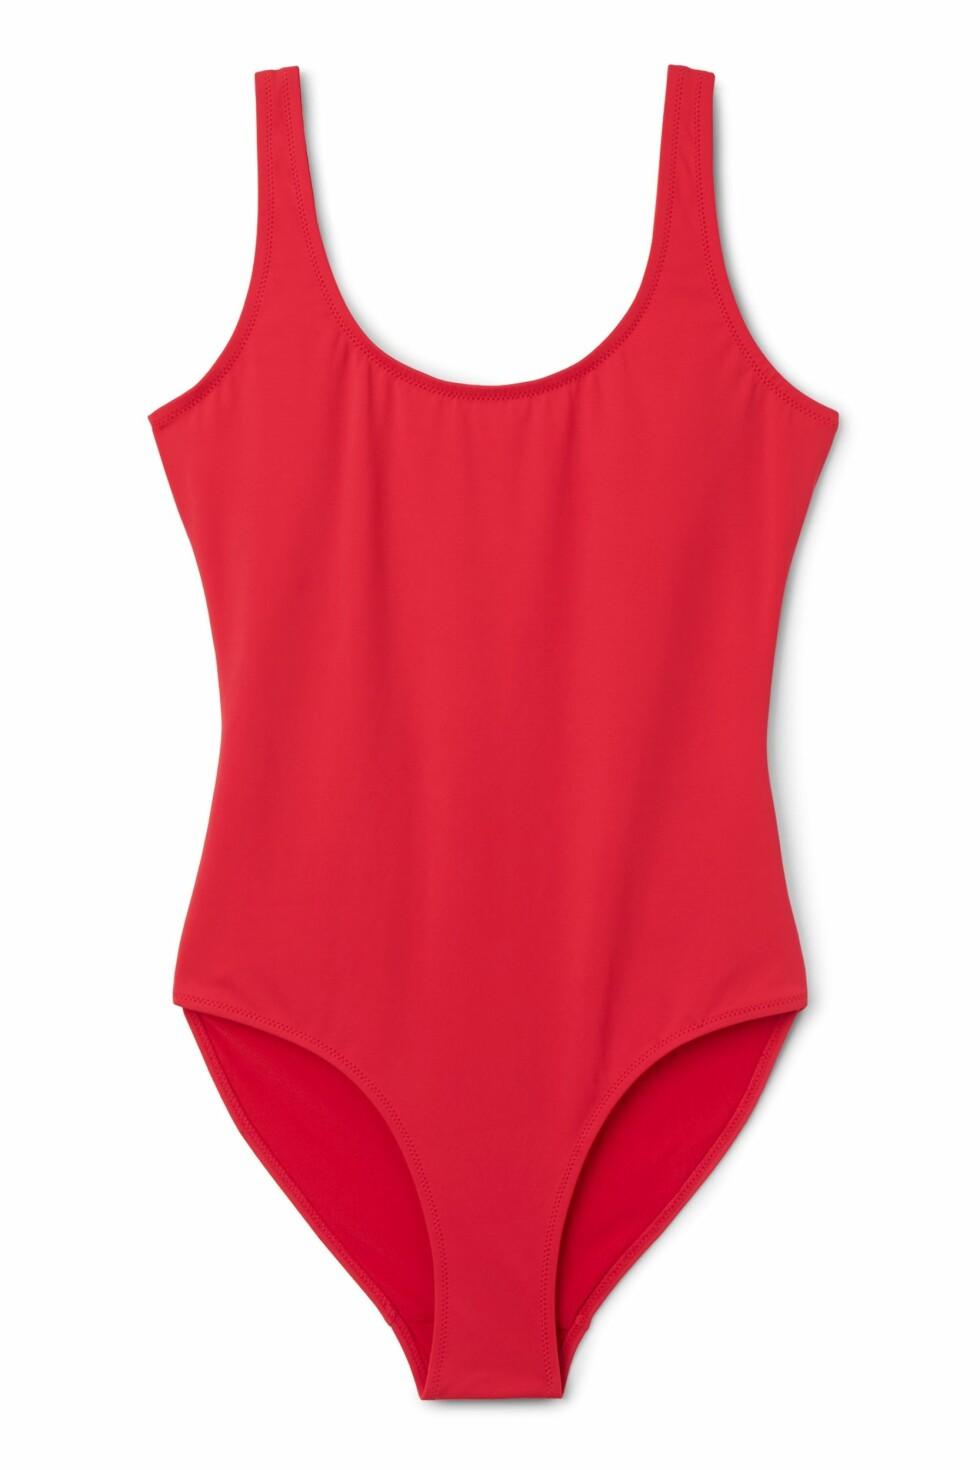 Badedrakt fra Weekday | kr 250 | http://shop.weekday.com/gb/Womens_shop/Swimwear/All/Day_Swimsuit/8278058-14016625.1#c-47958#Rel?PC=YMAL